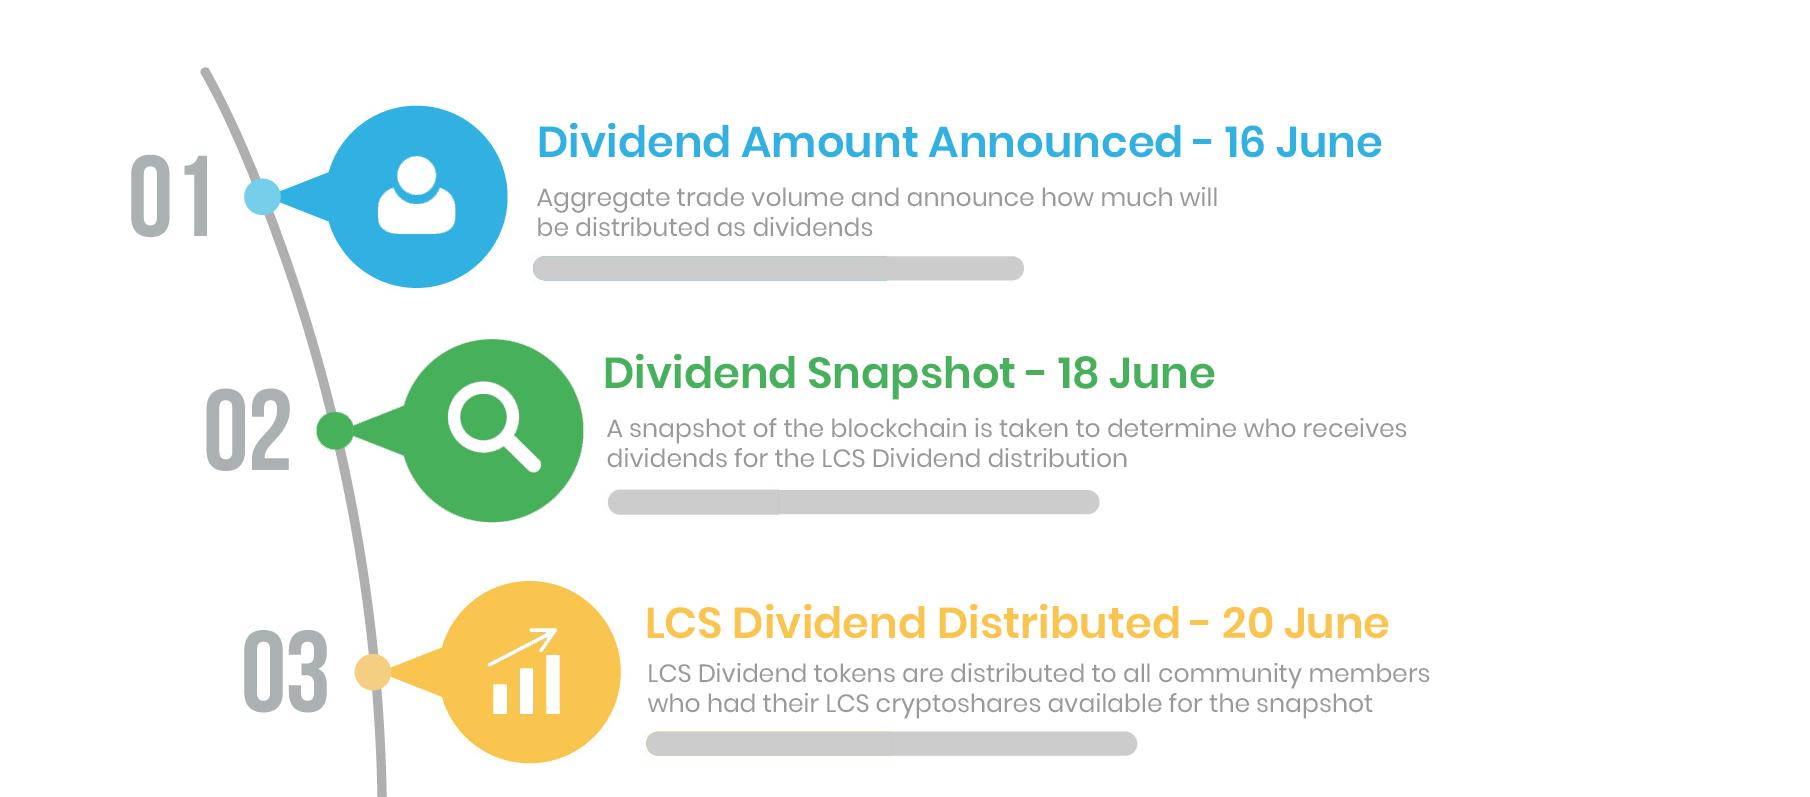 dividend breakdown